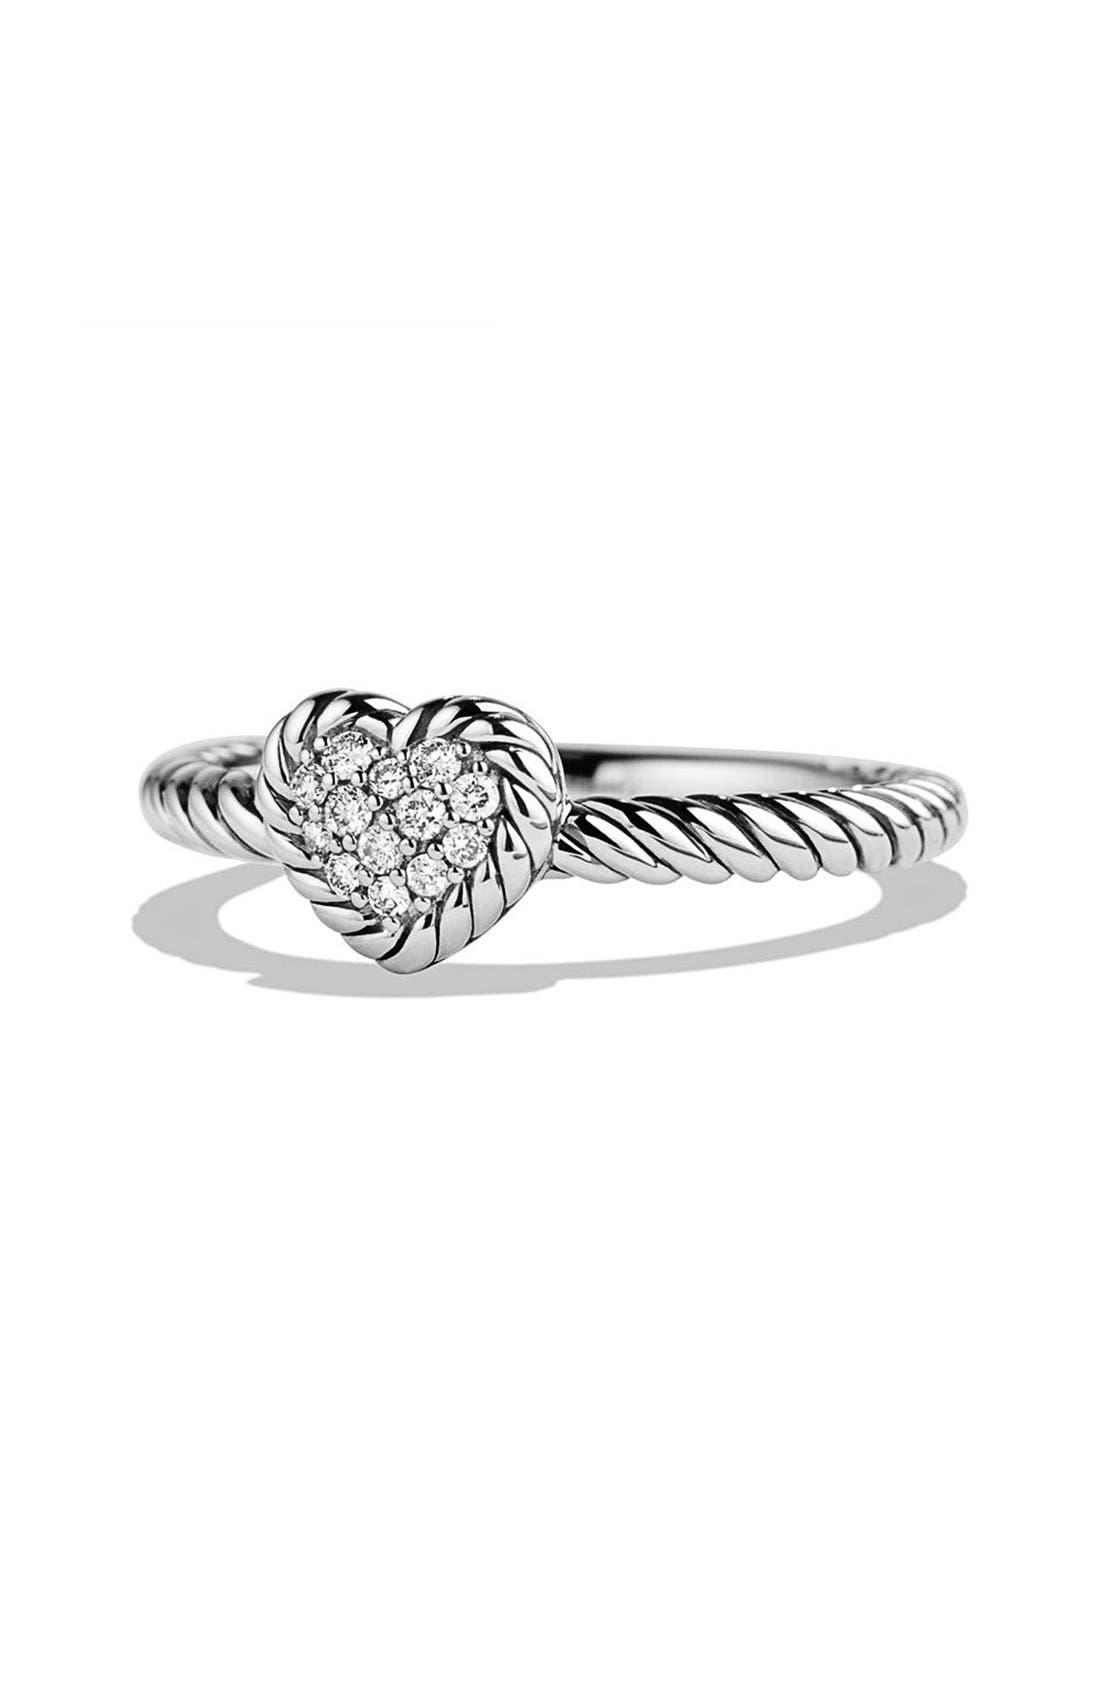 David Yurman 'Châtelaine' Heart Ring with Diamonds